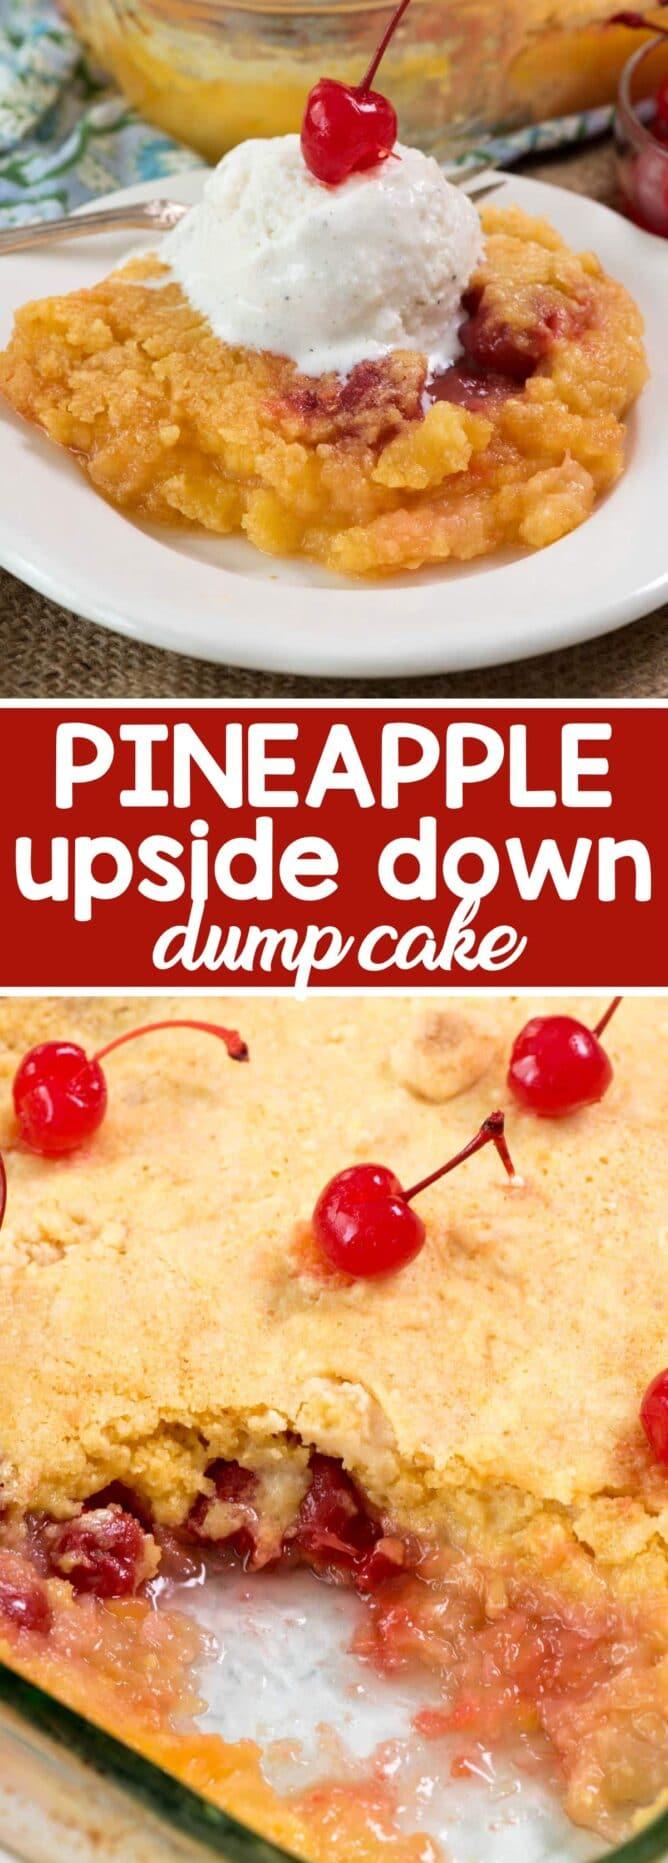 Pineapple Upside Down Dump Cake collage photos